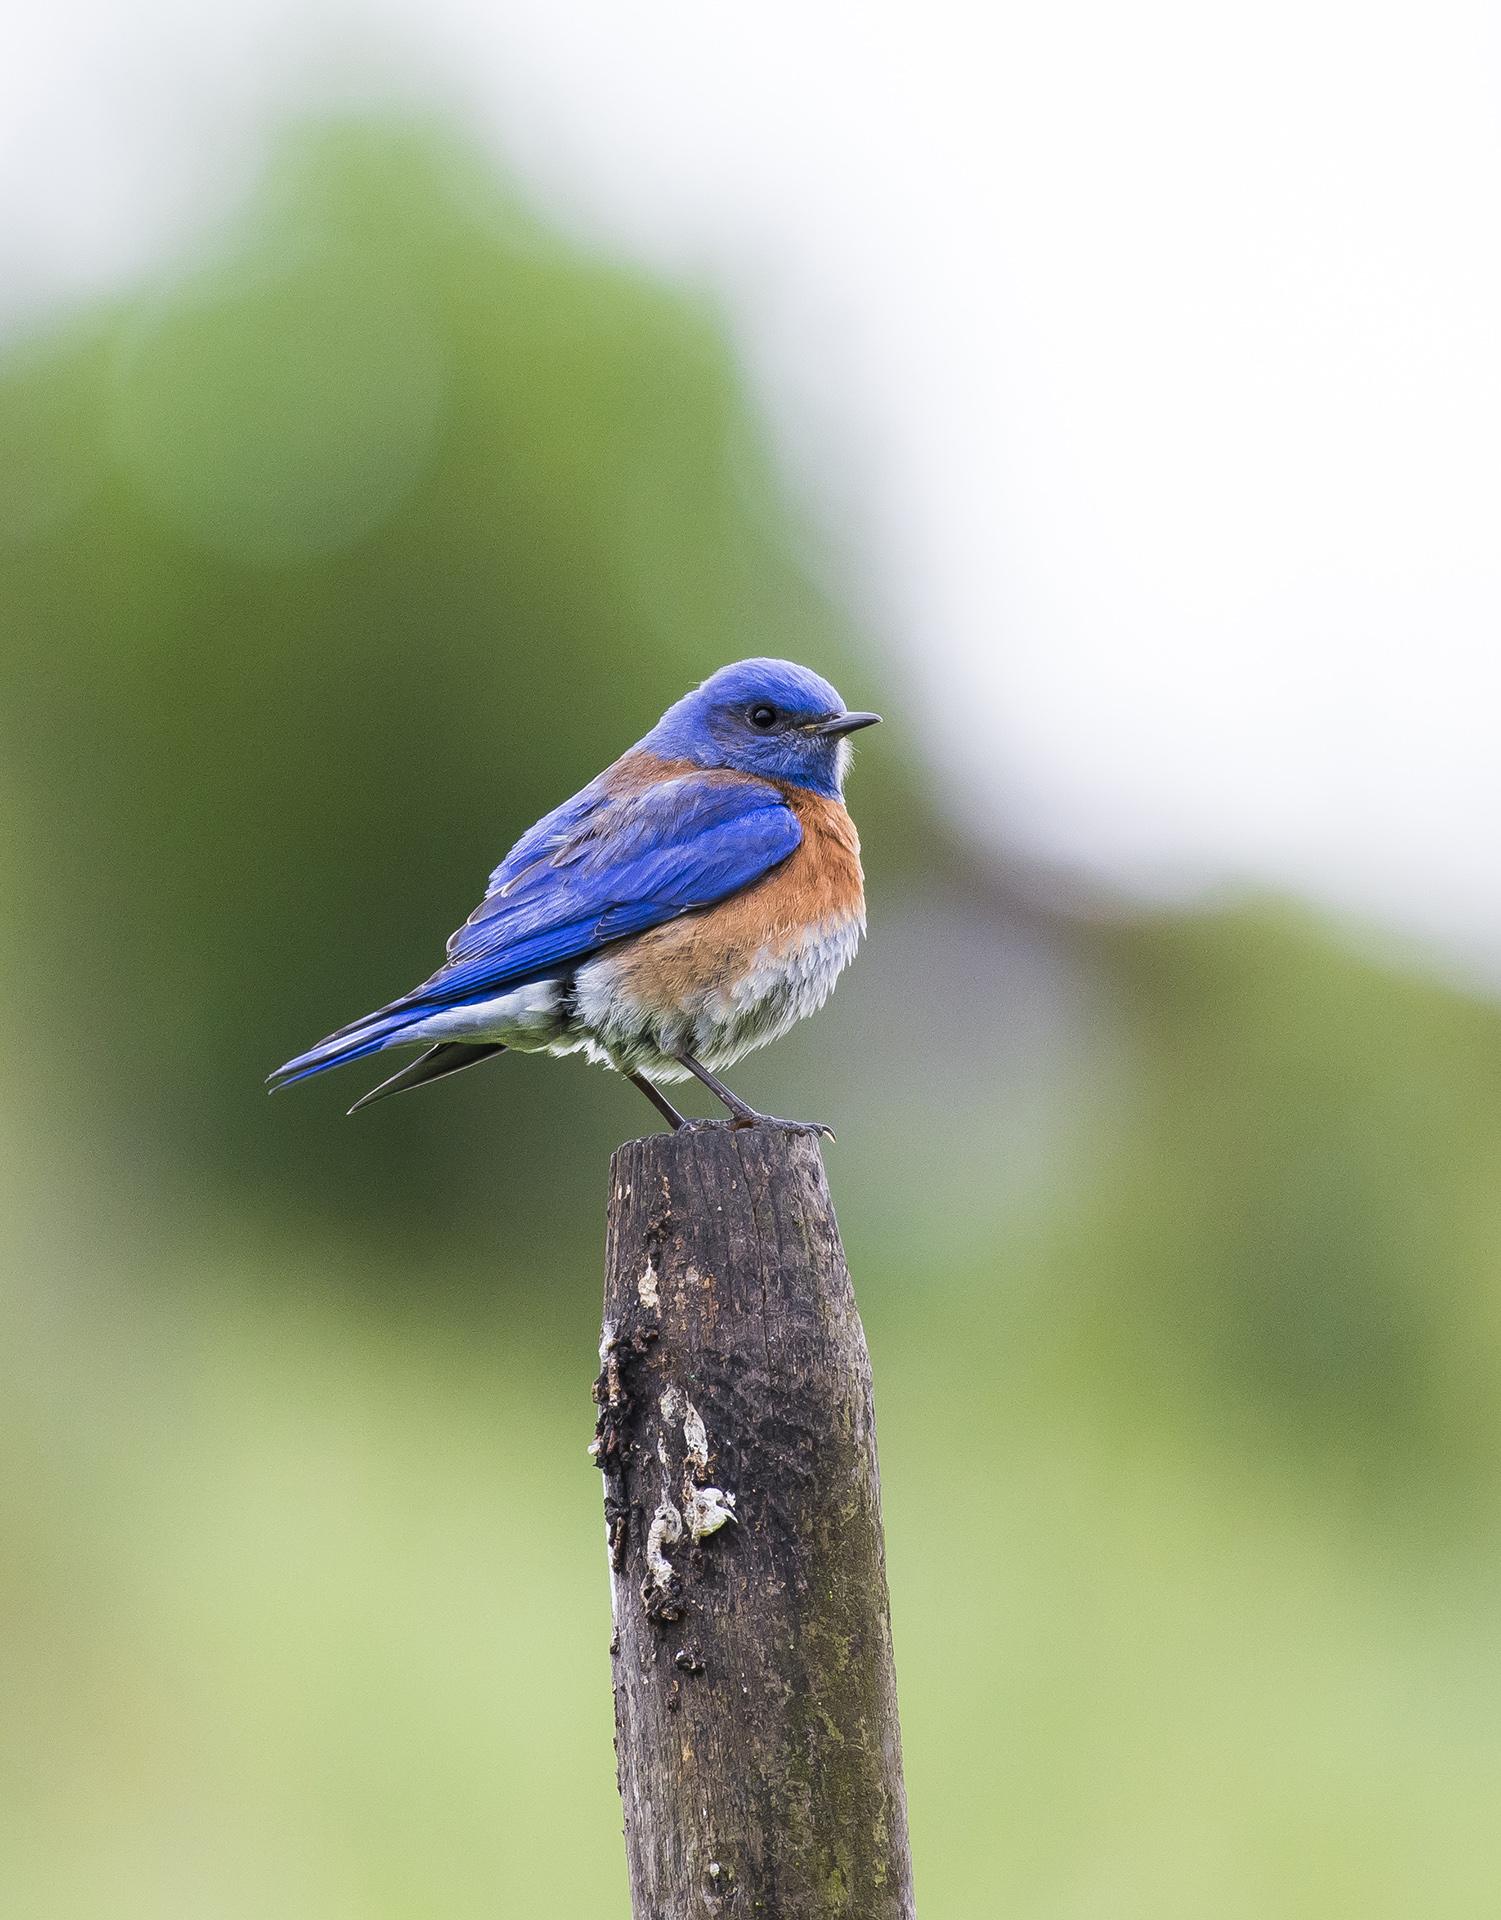 A western bluebird ( Sialia mexicana ) perched on a stake in a San Ramon neighborhood